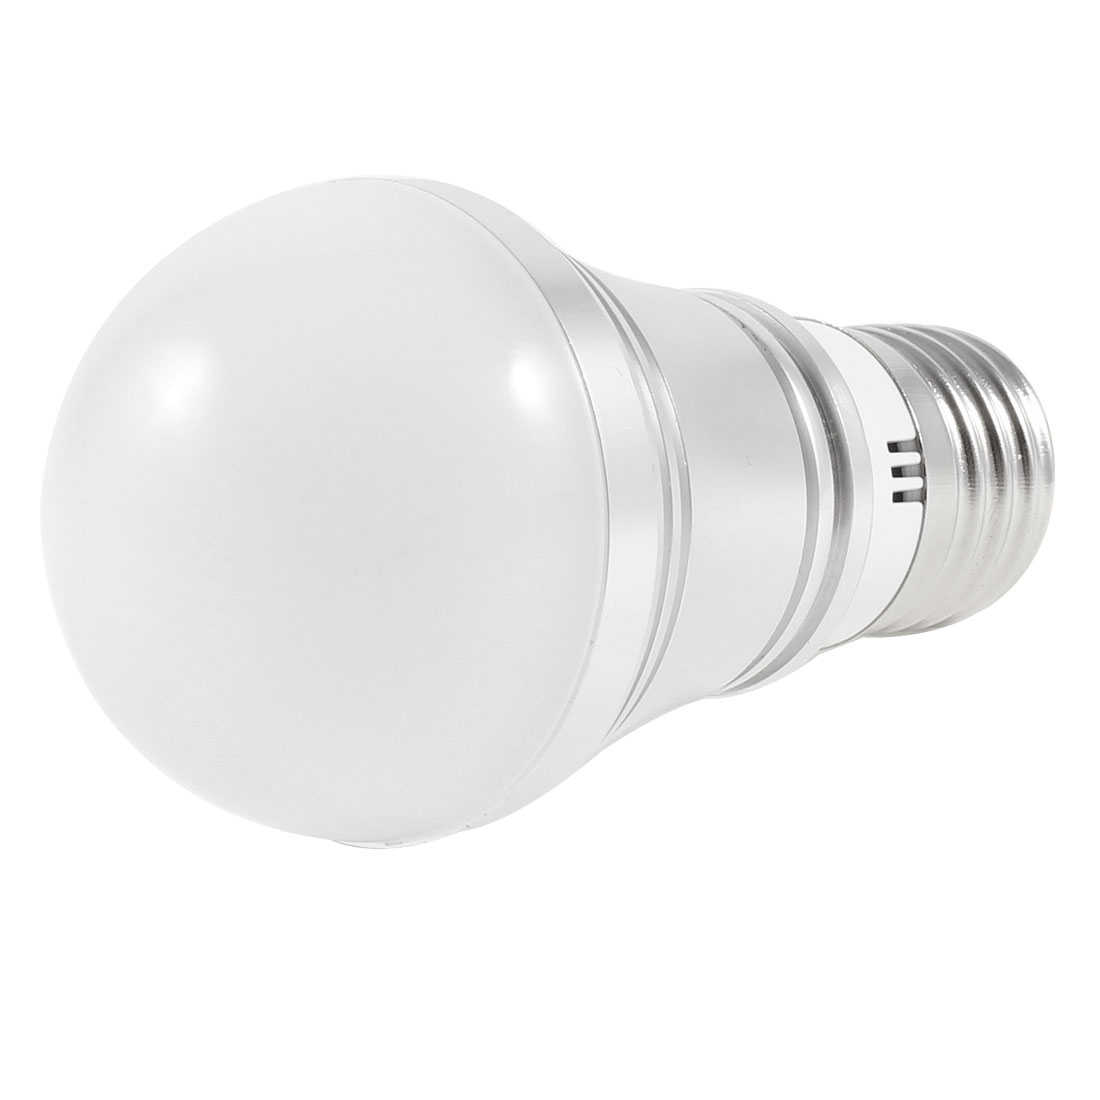 Silver Tone E27 Socket Warm White LED Light Globe Ball Bulb 3W AC 220V